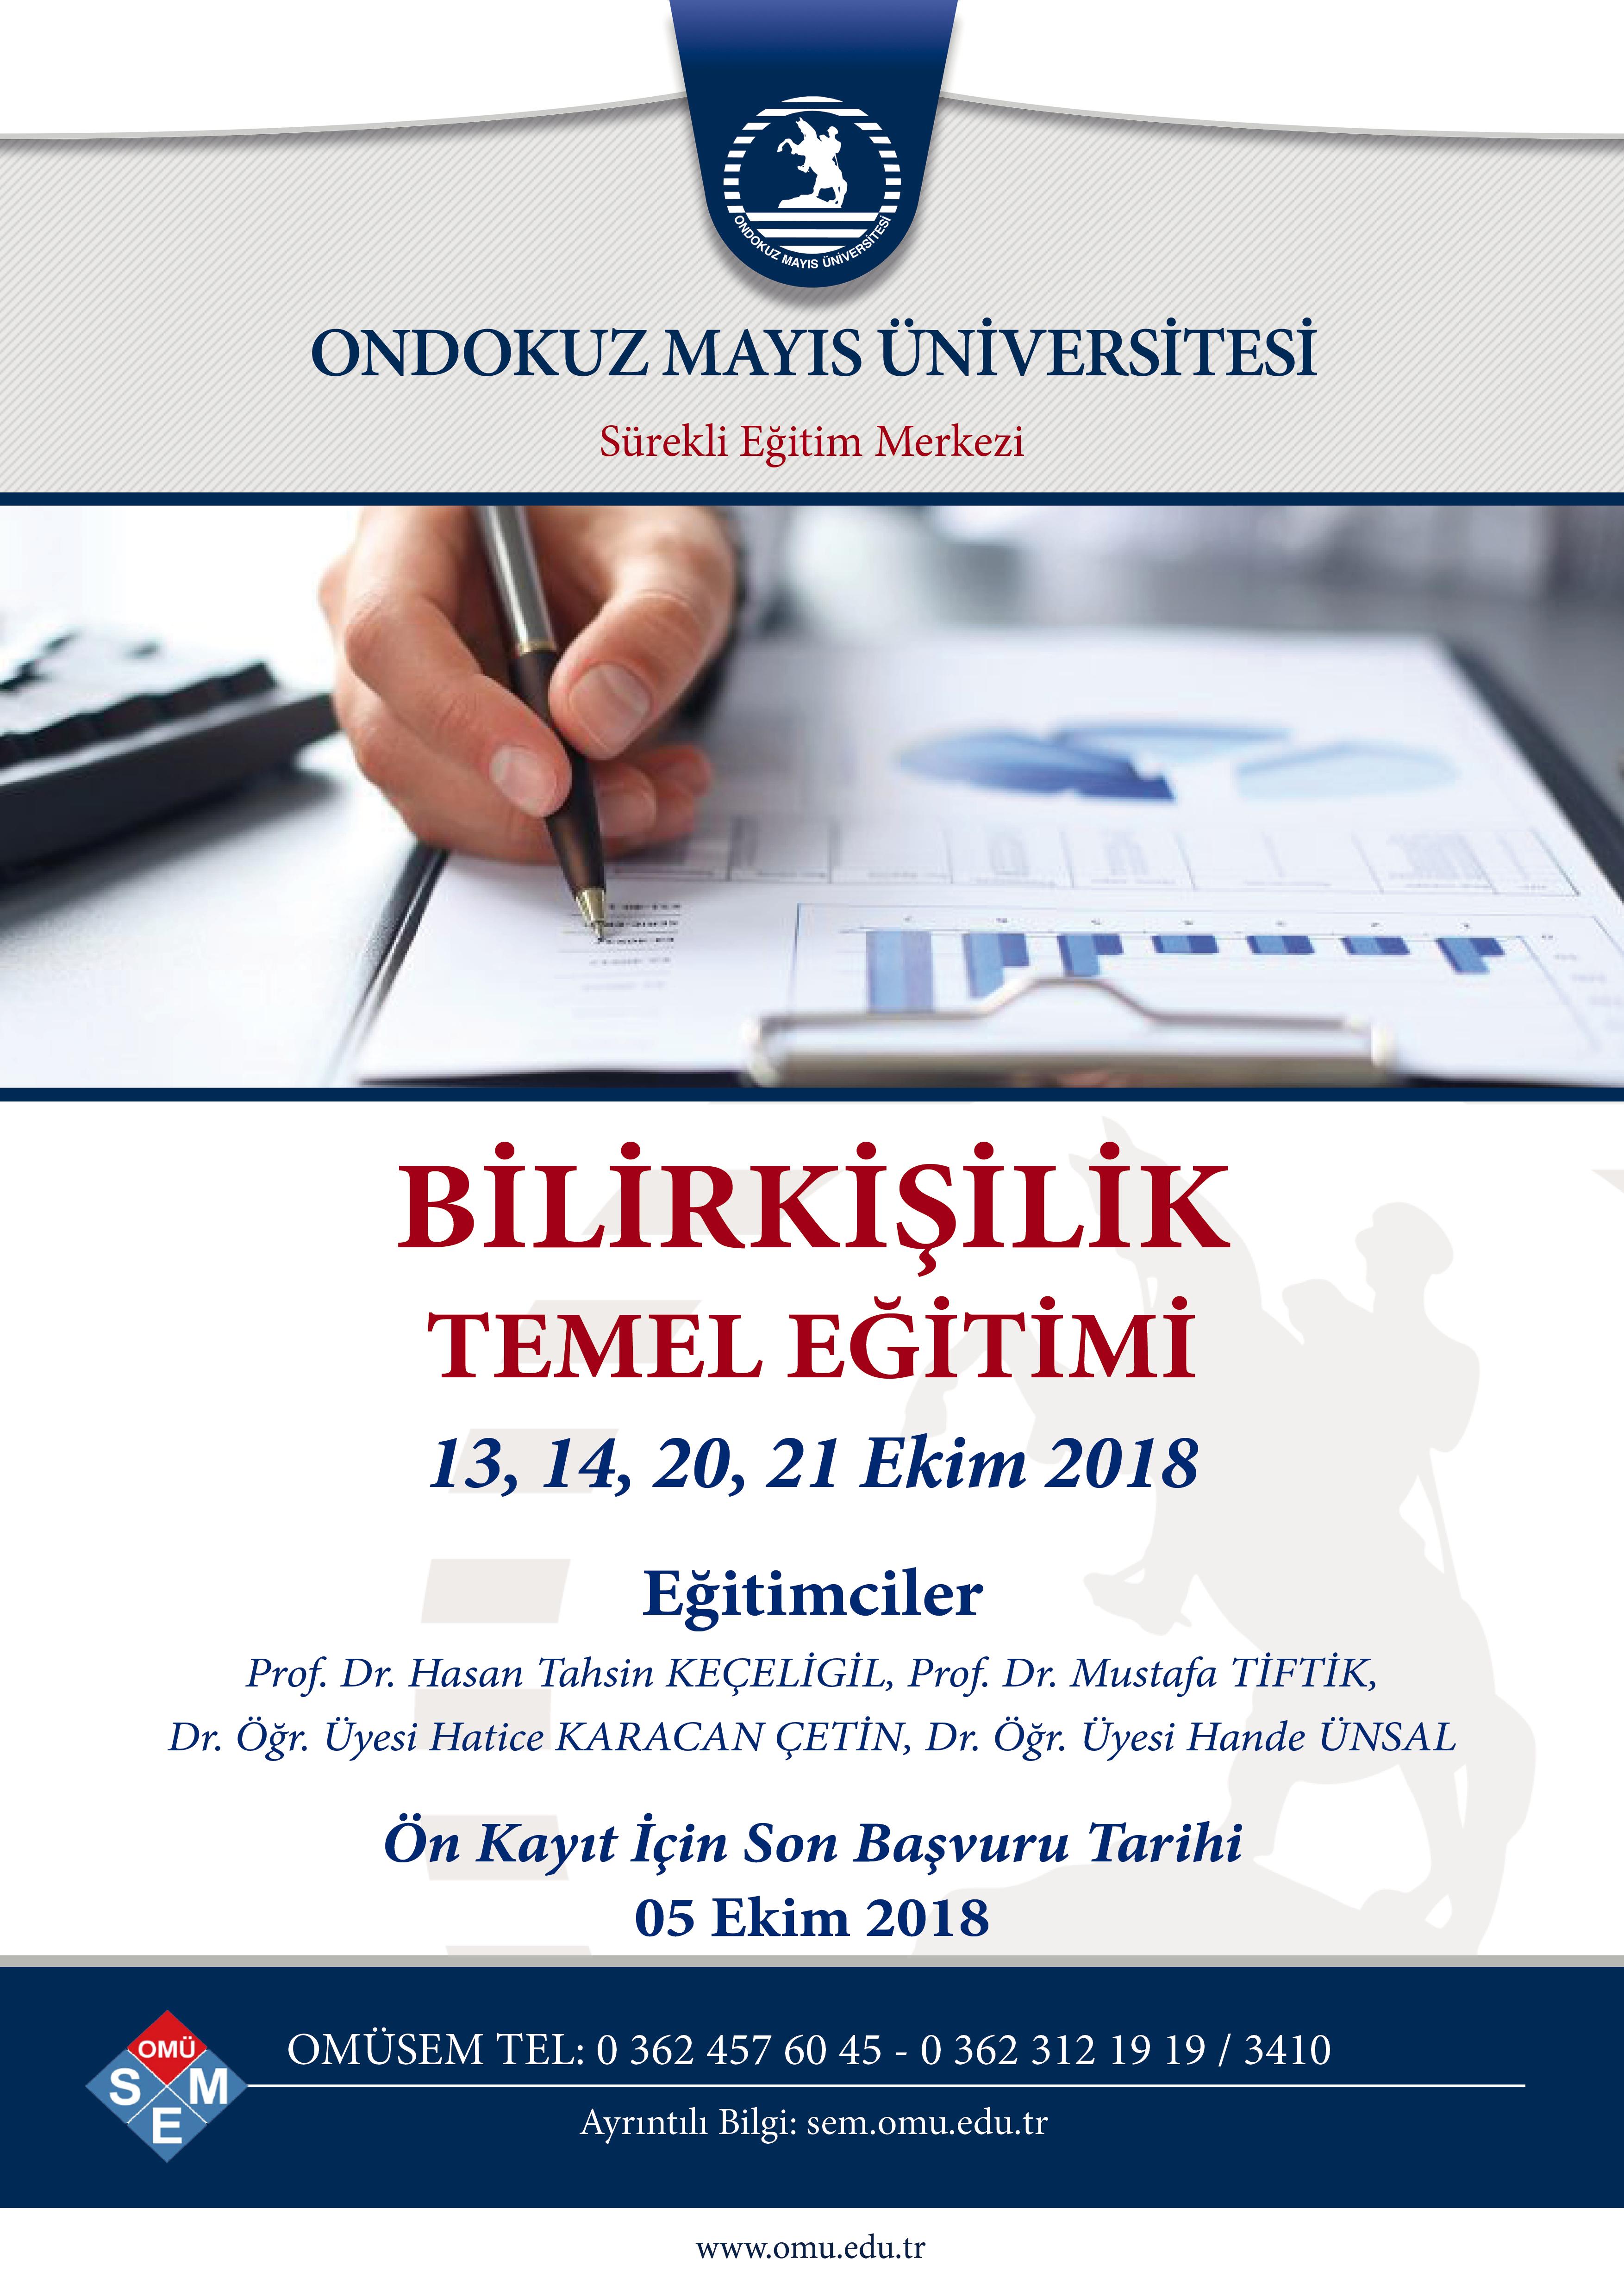 https://www.omu.edu.tr/sites/default/files/bilirkisilik_temel_egitimi_-afis.jpg